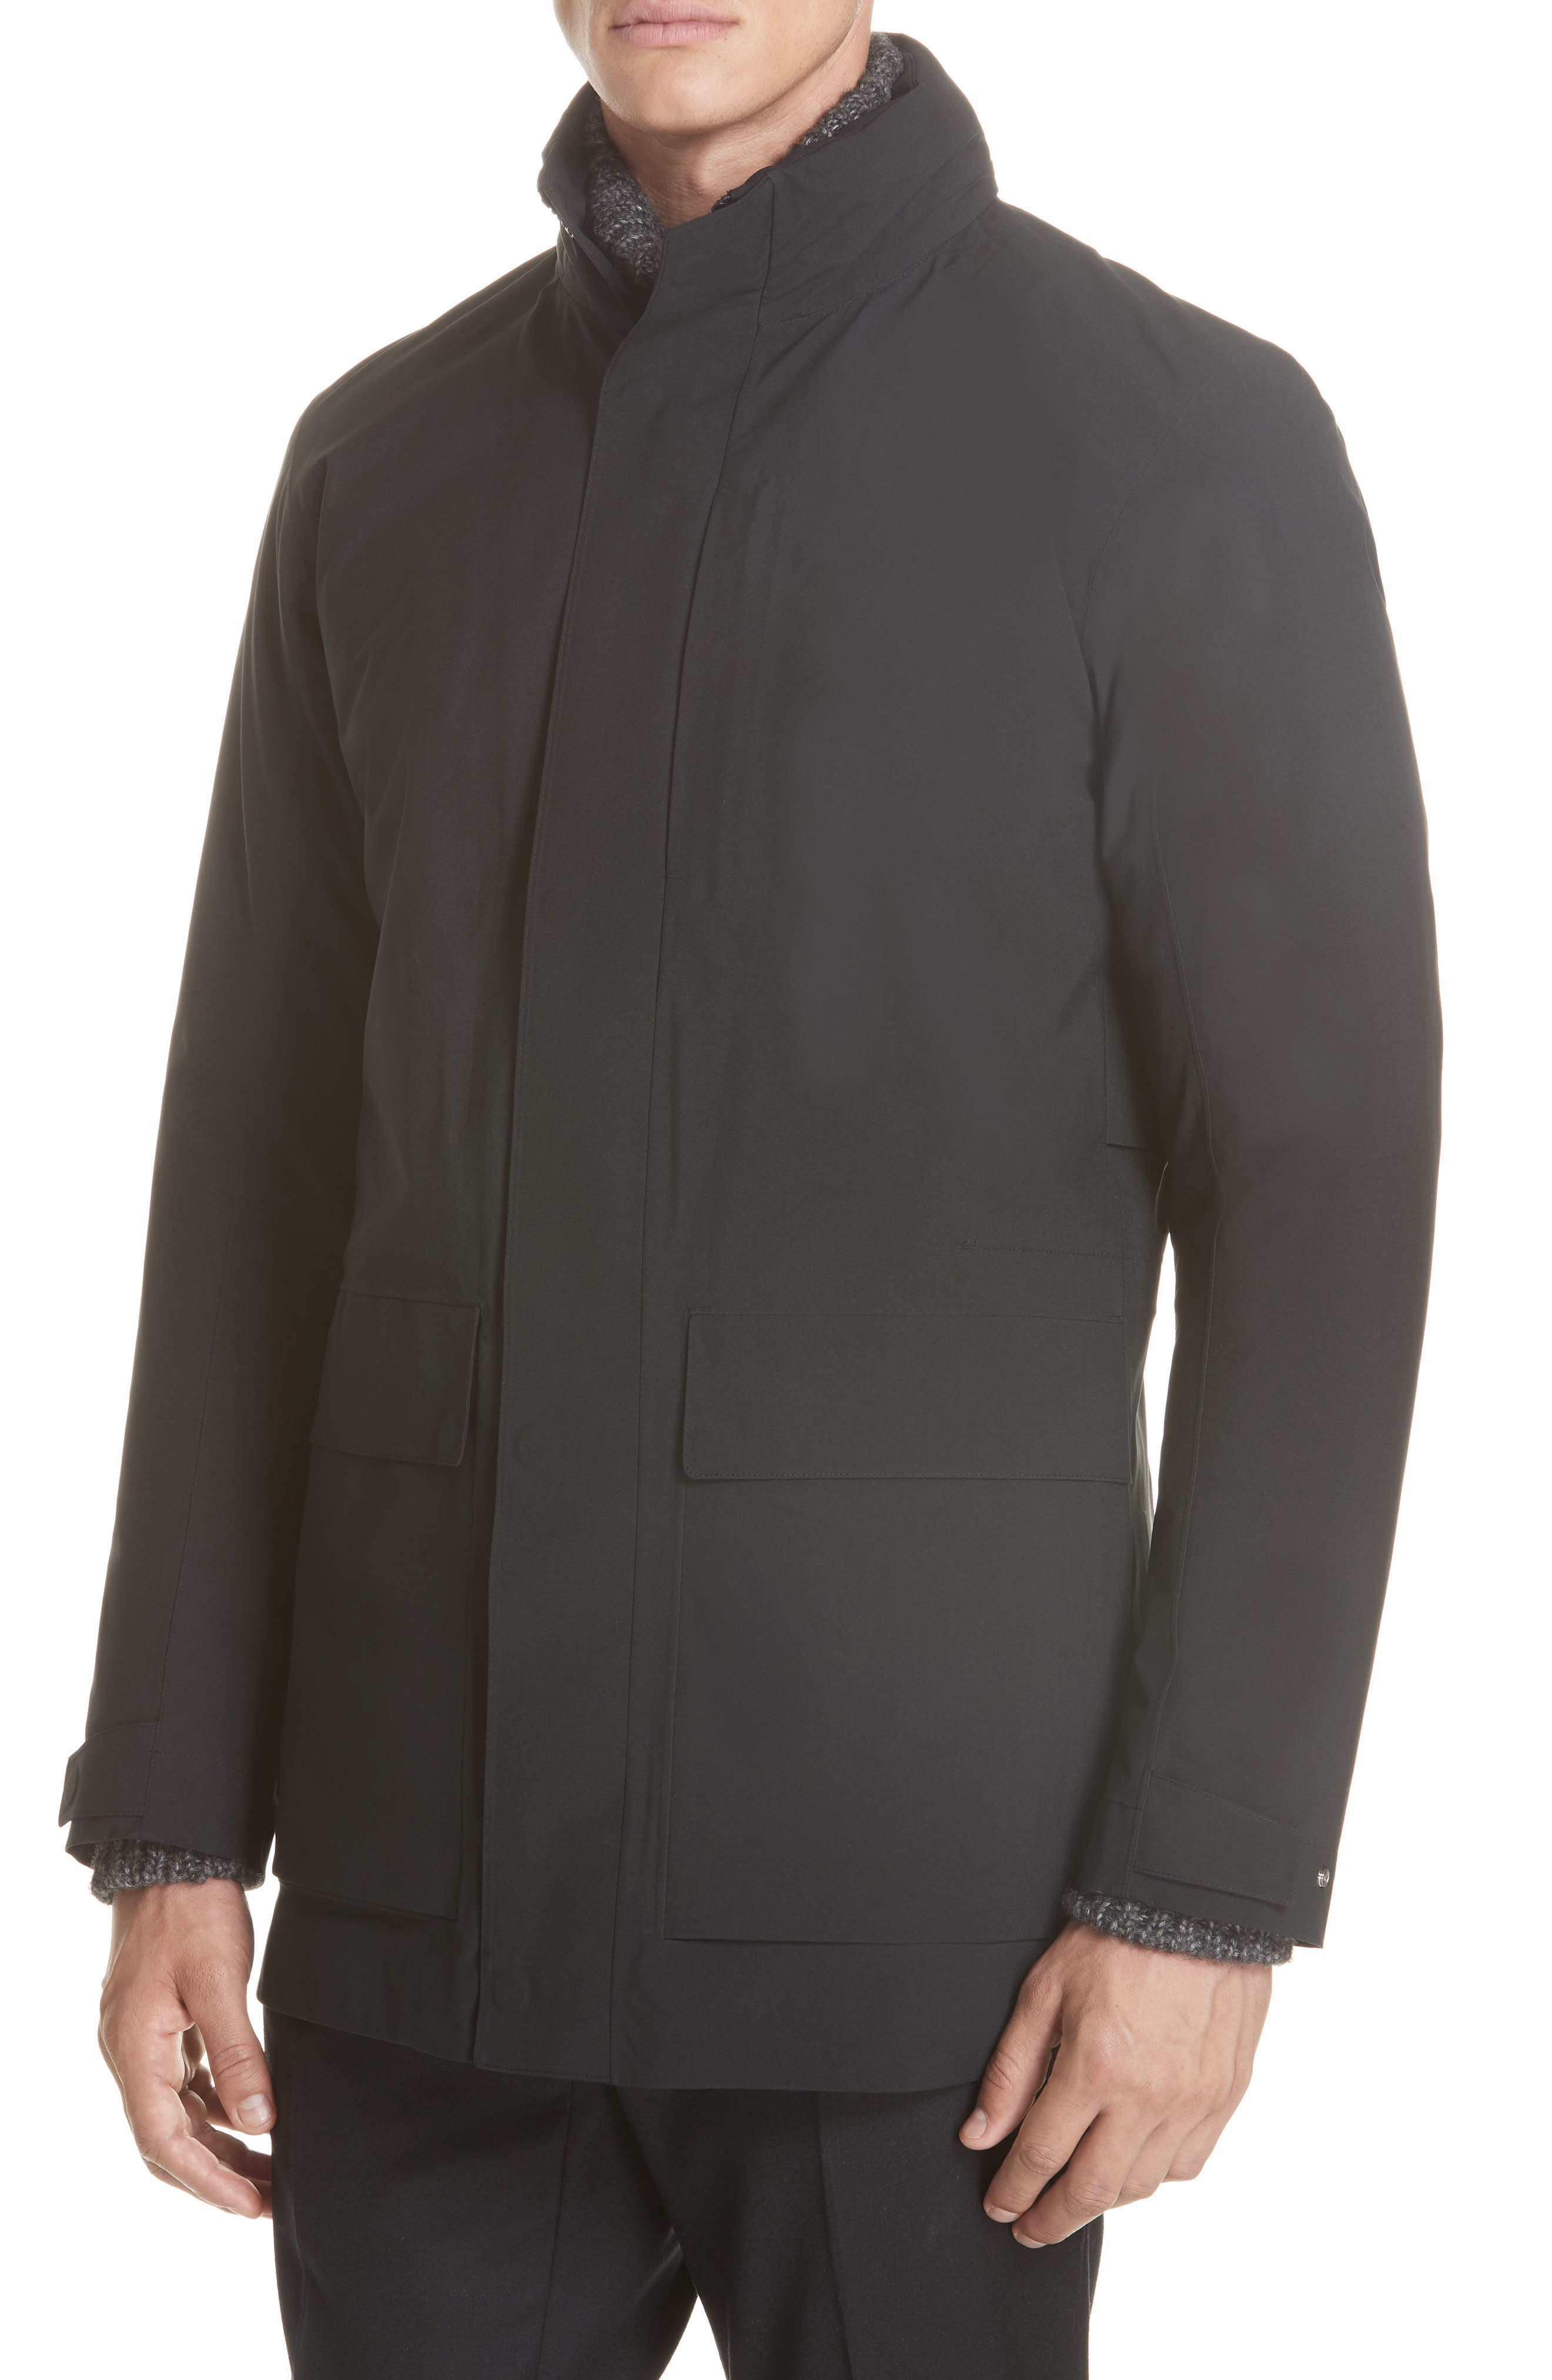 Z Zenga Trim Fit 3-in-1 Jacket,                             Alternate thumbnail 5, color,                             BLACK